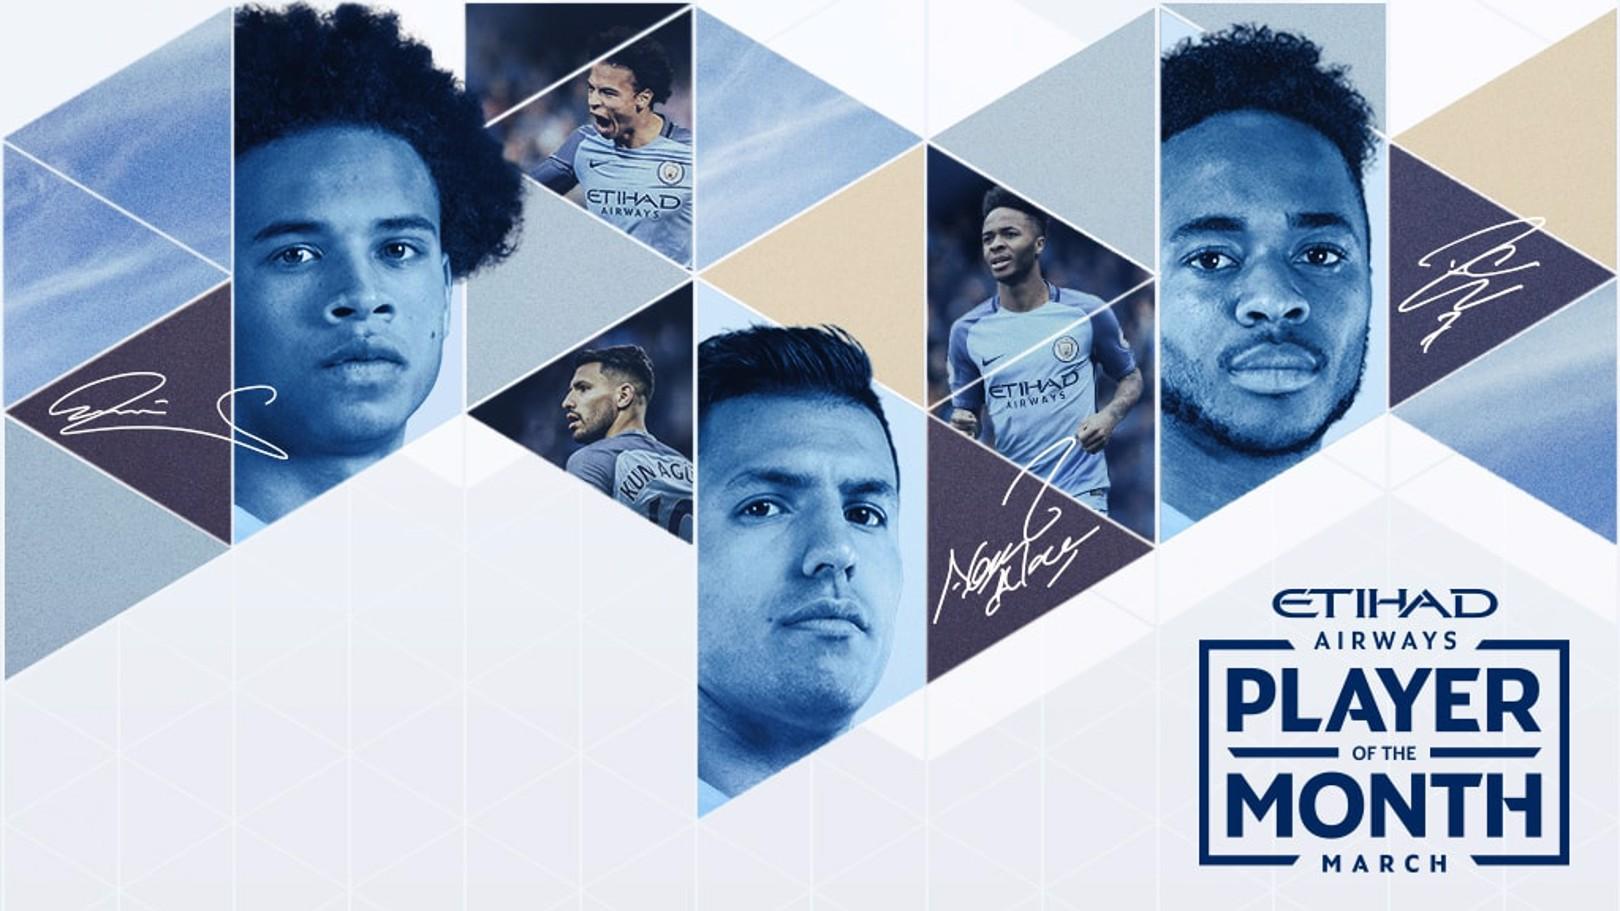 El jugador del mes: marzo